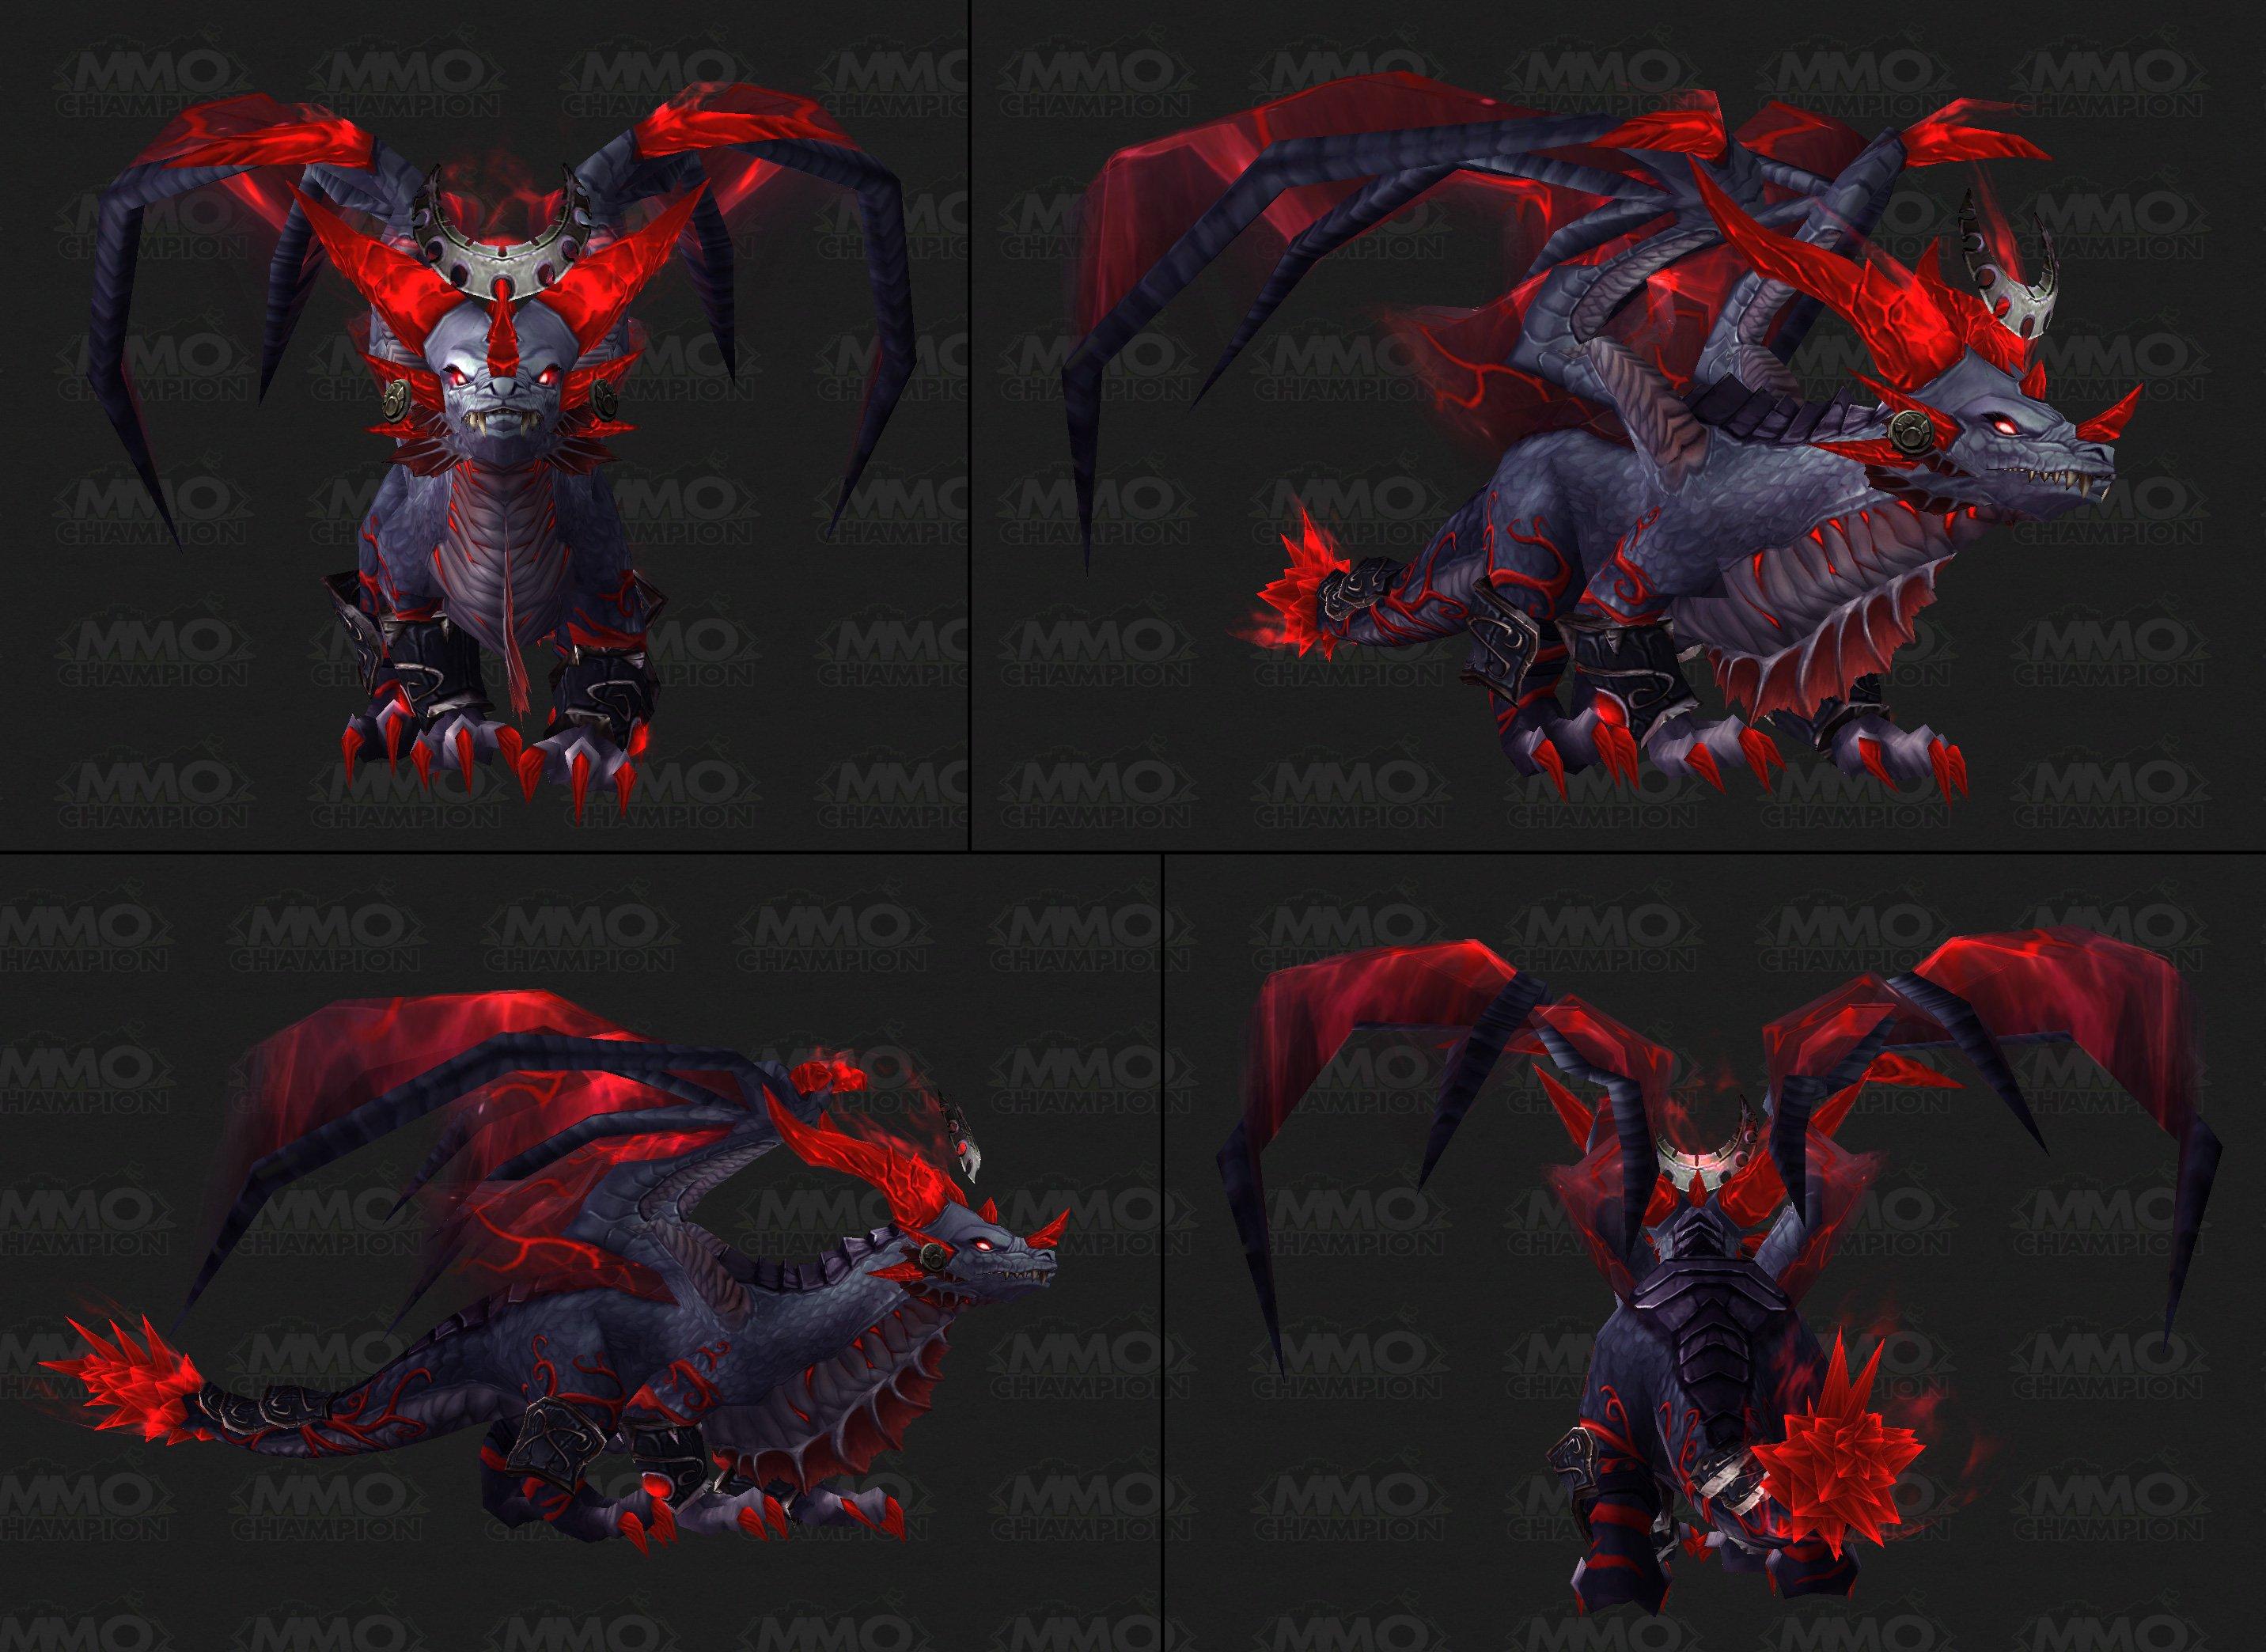 World of warcraft legion beta datamined stuff neogaf